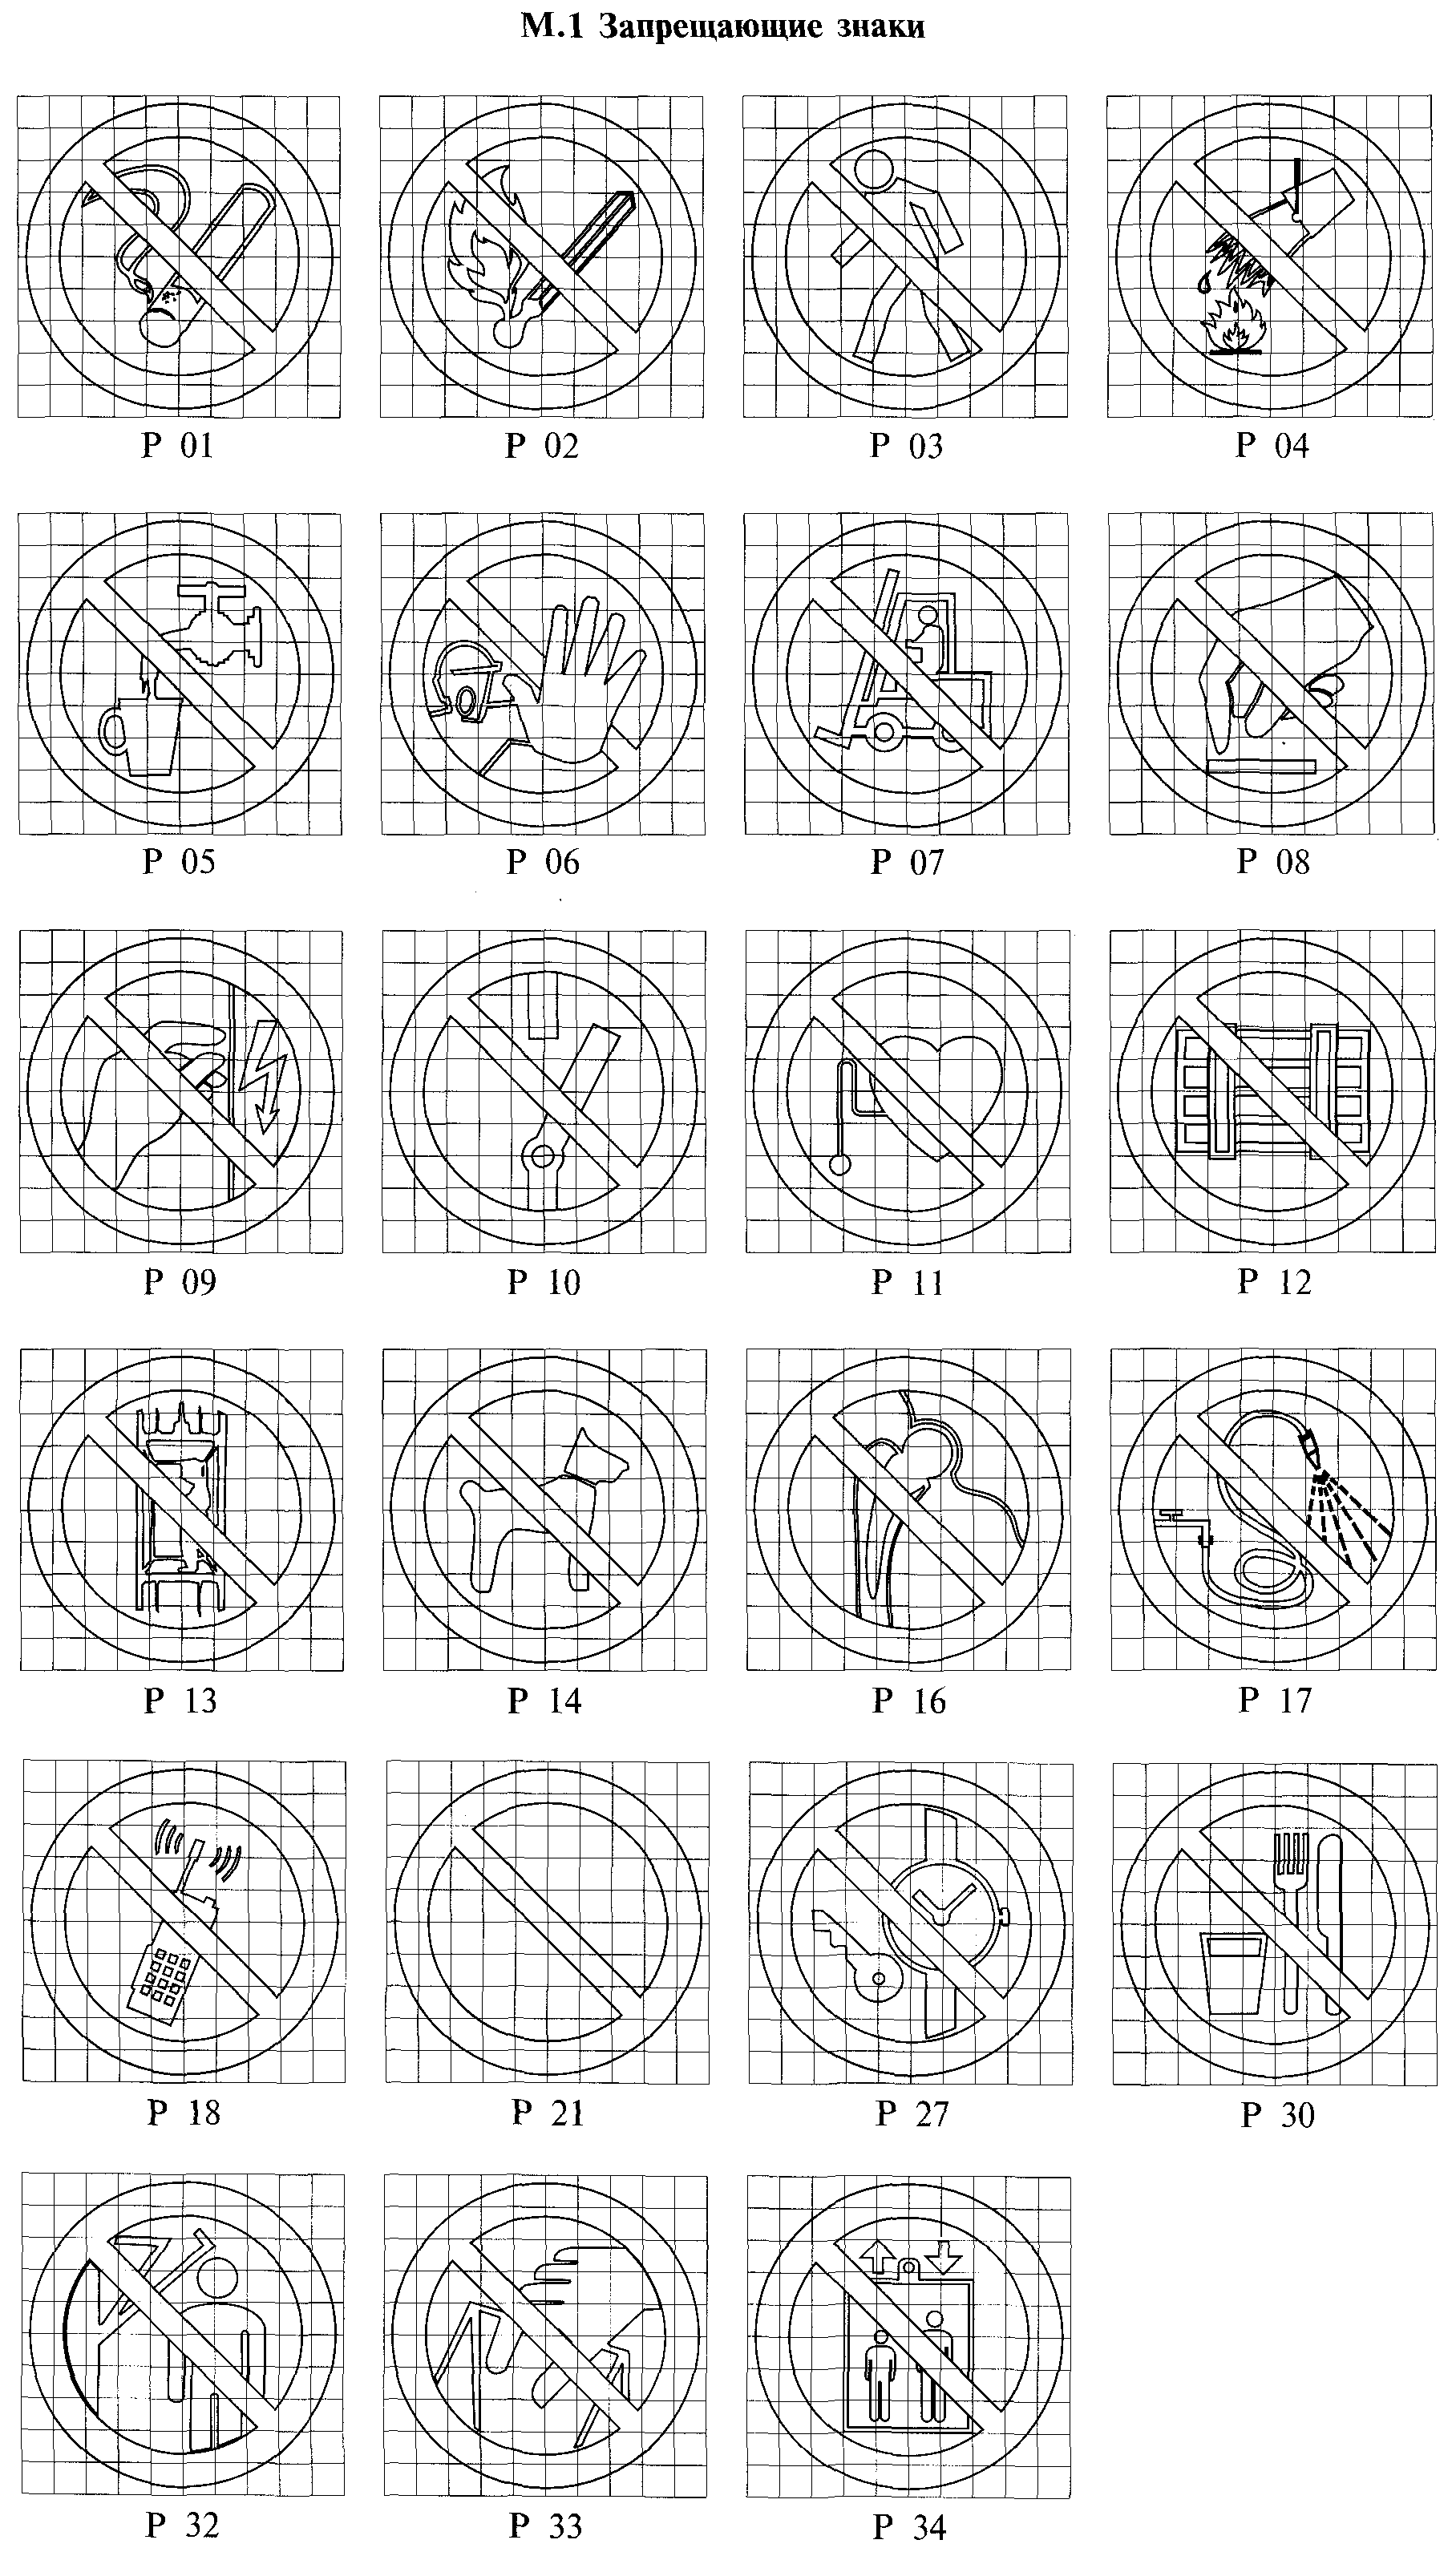 РИСУНОК М.1. К ГОСТ Р 12.4.026-2001